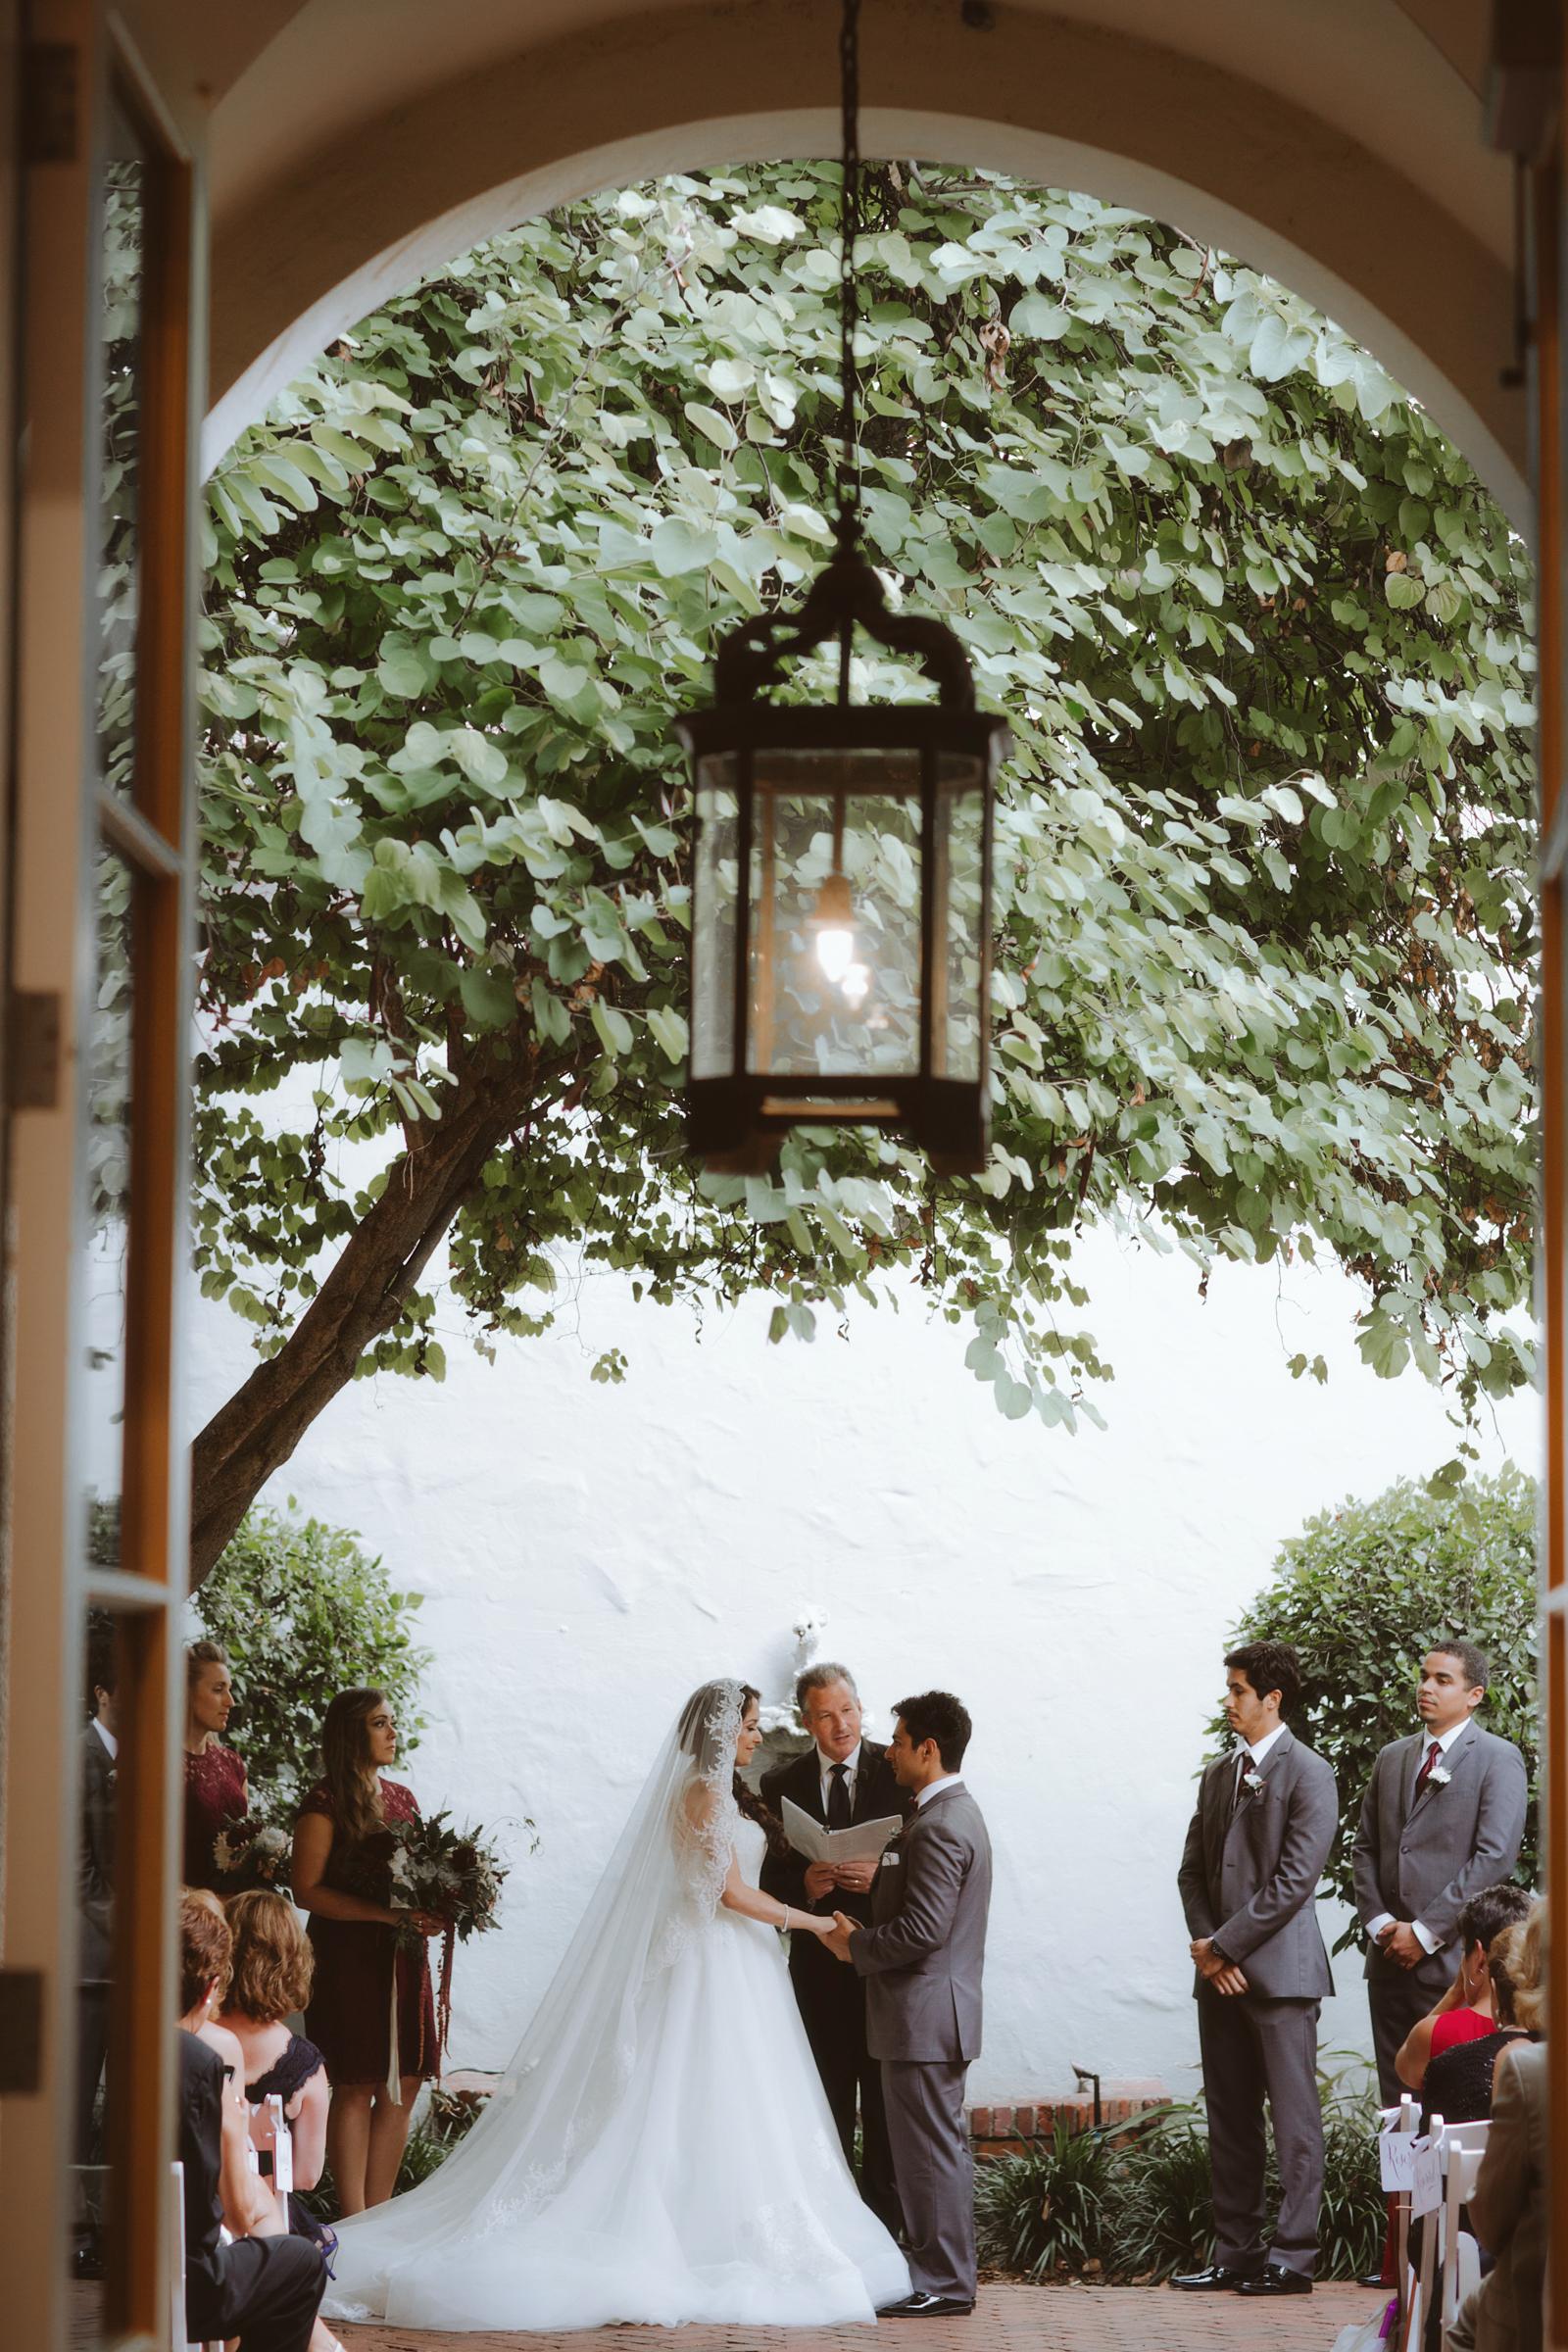 wedding day | MFA St Pete | Vanessa Boy Photography | vanessaboy.com-342.com |final.jpg